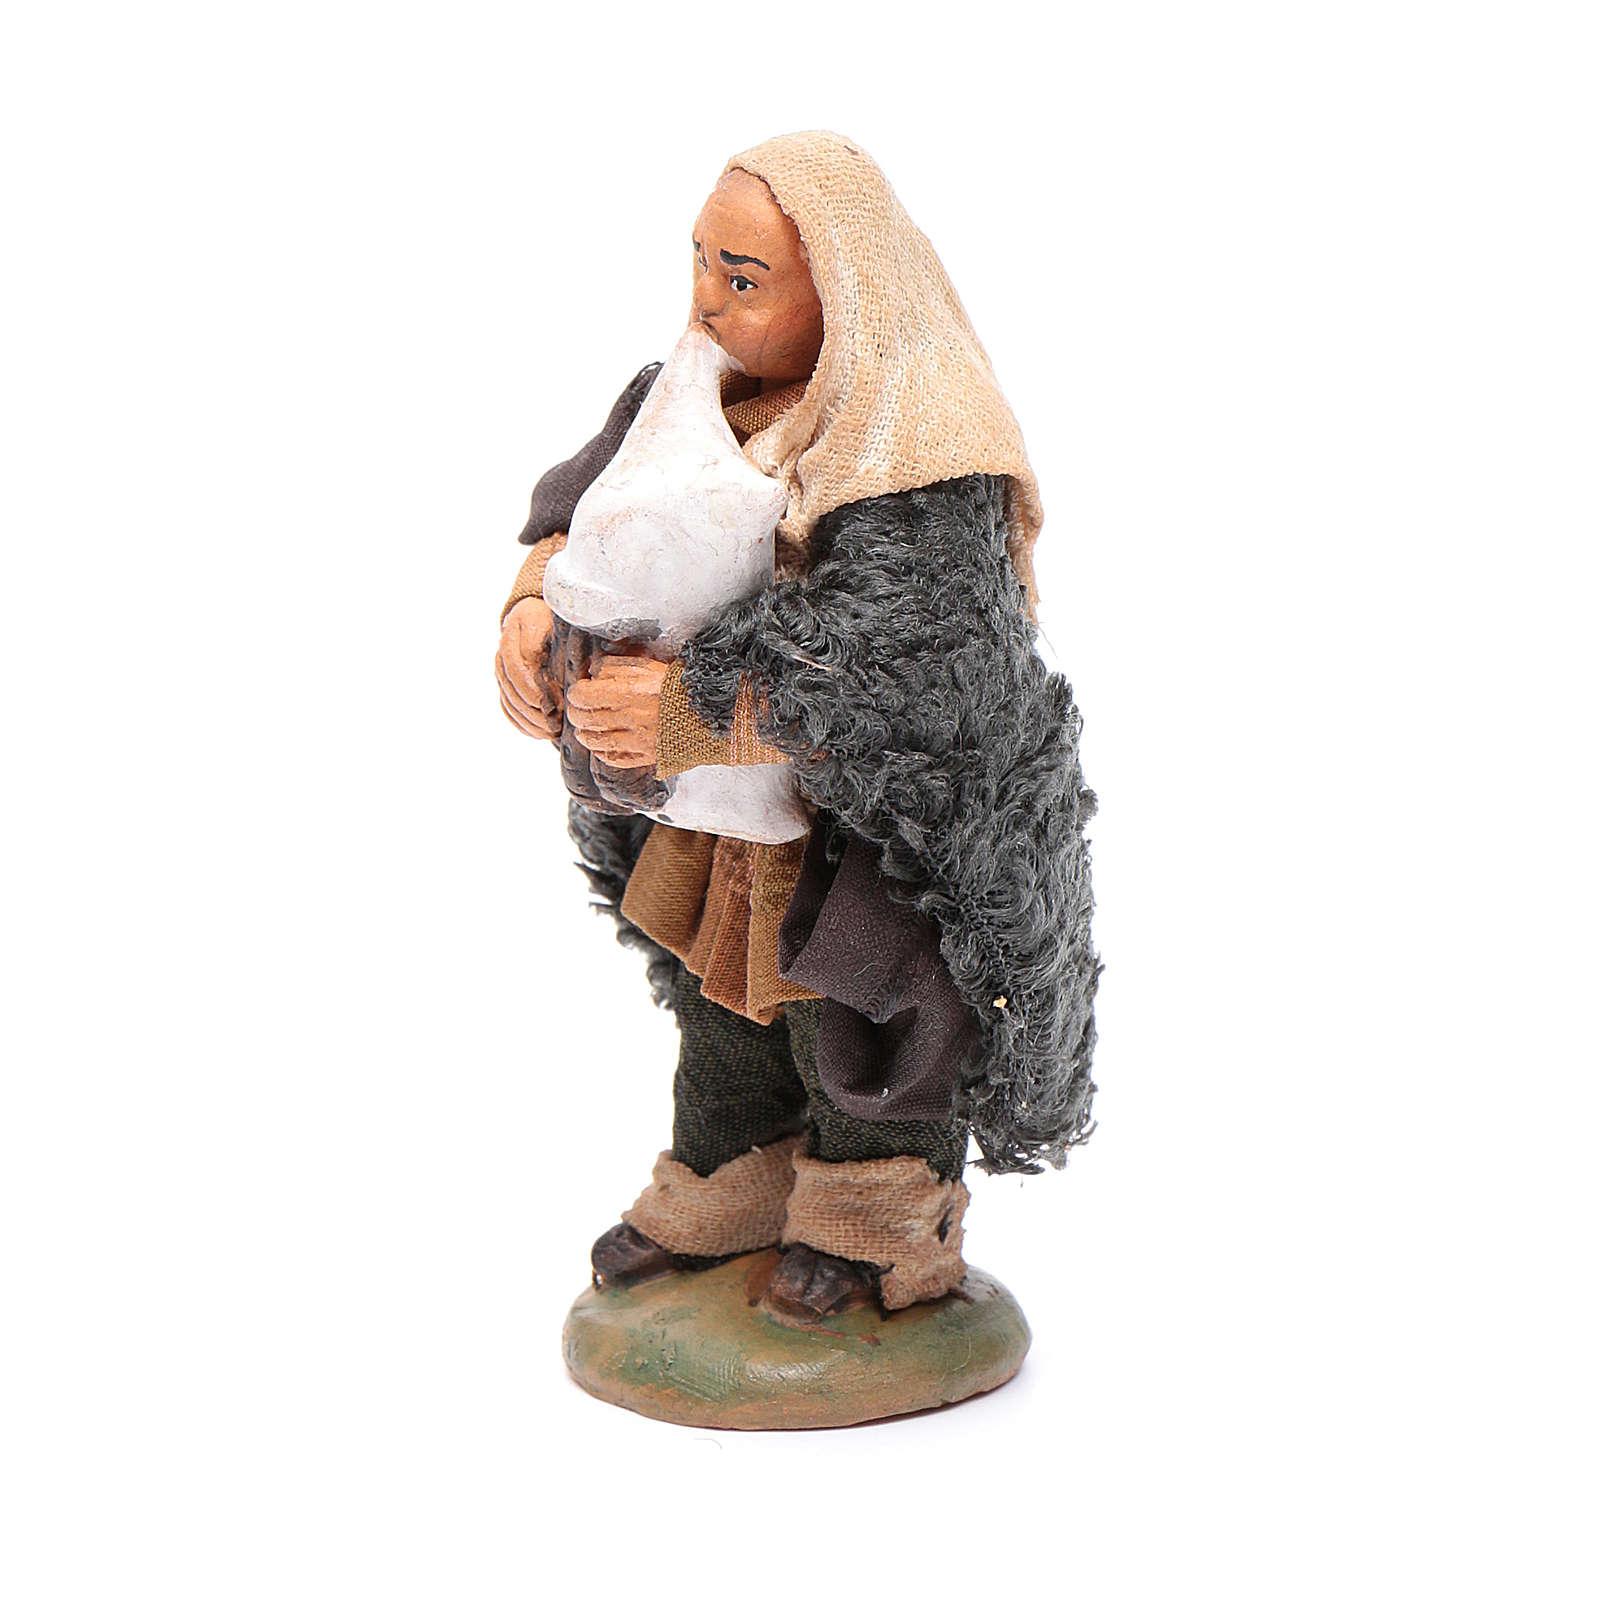 Nativity set accessory Piper 10cm clay figurine 4